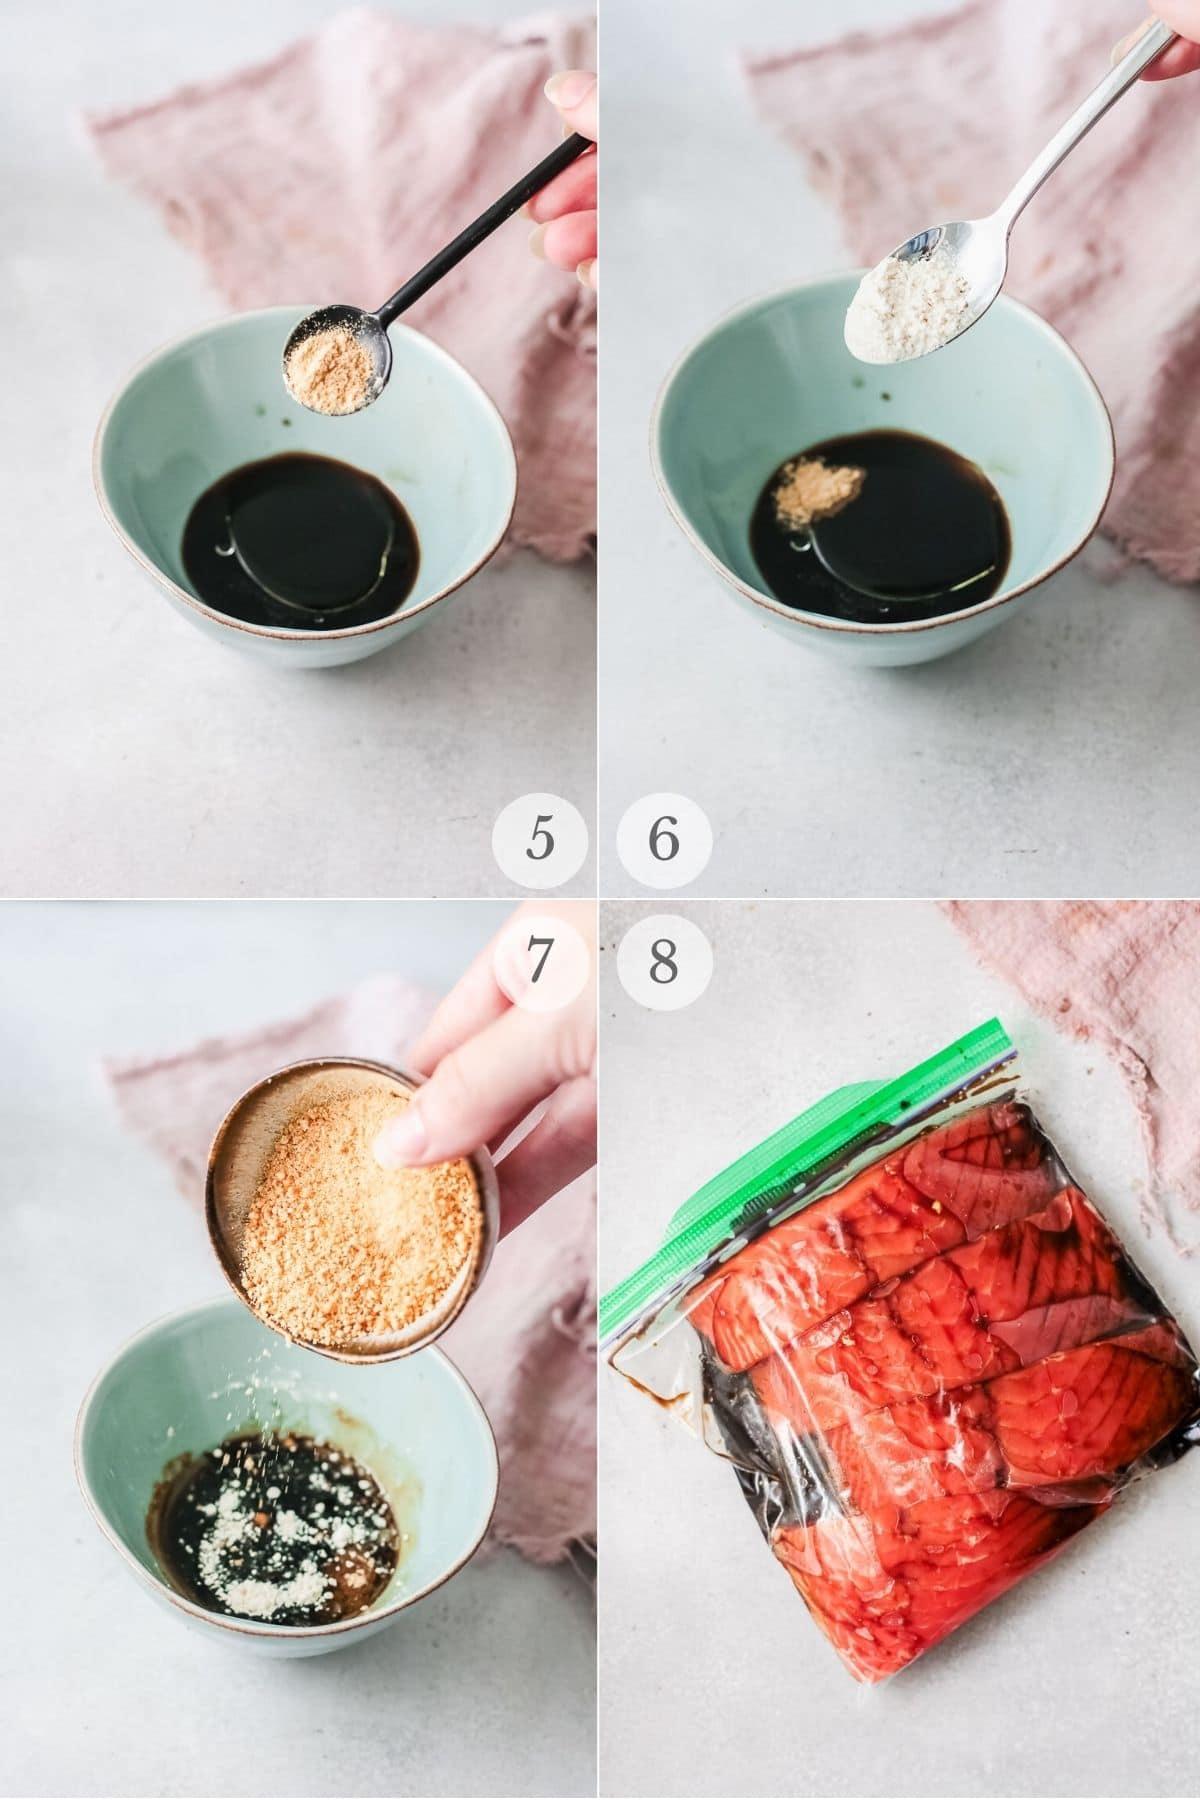 teriyaki salmon recipes steps 5-8